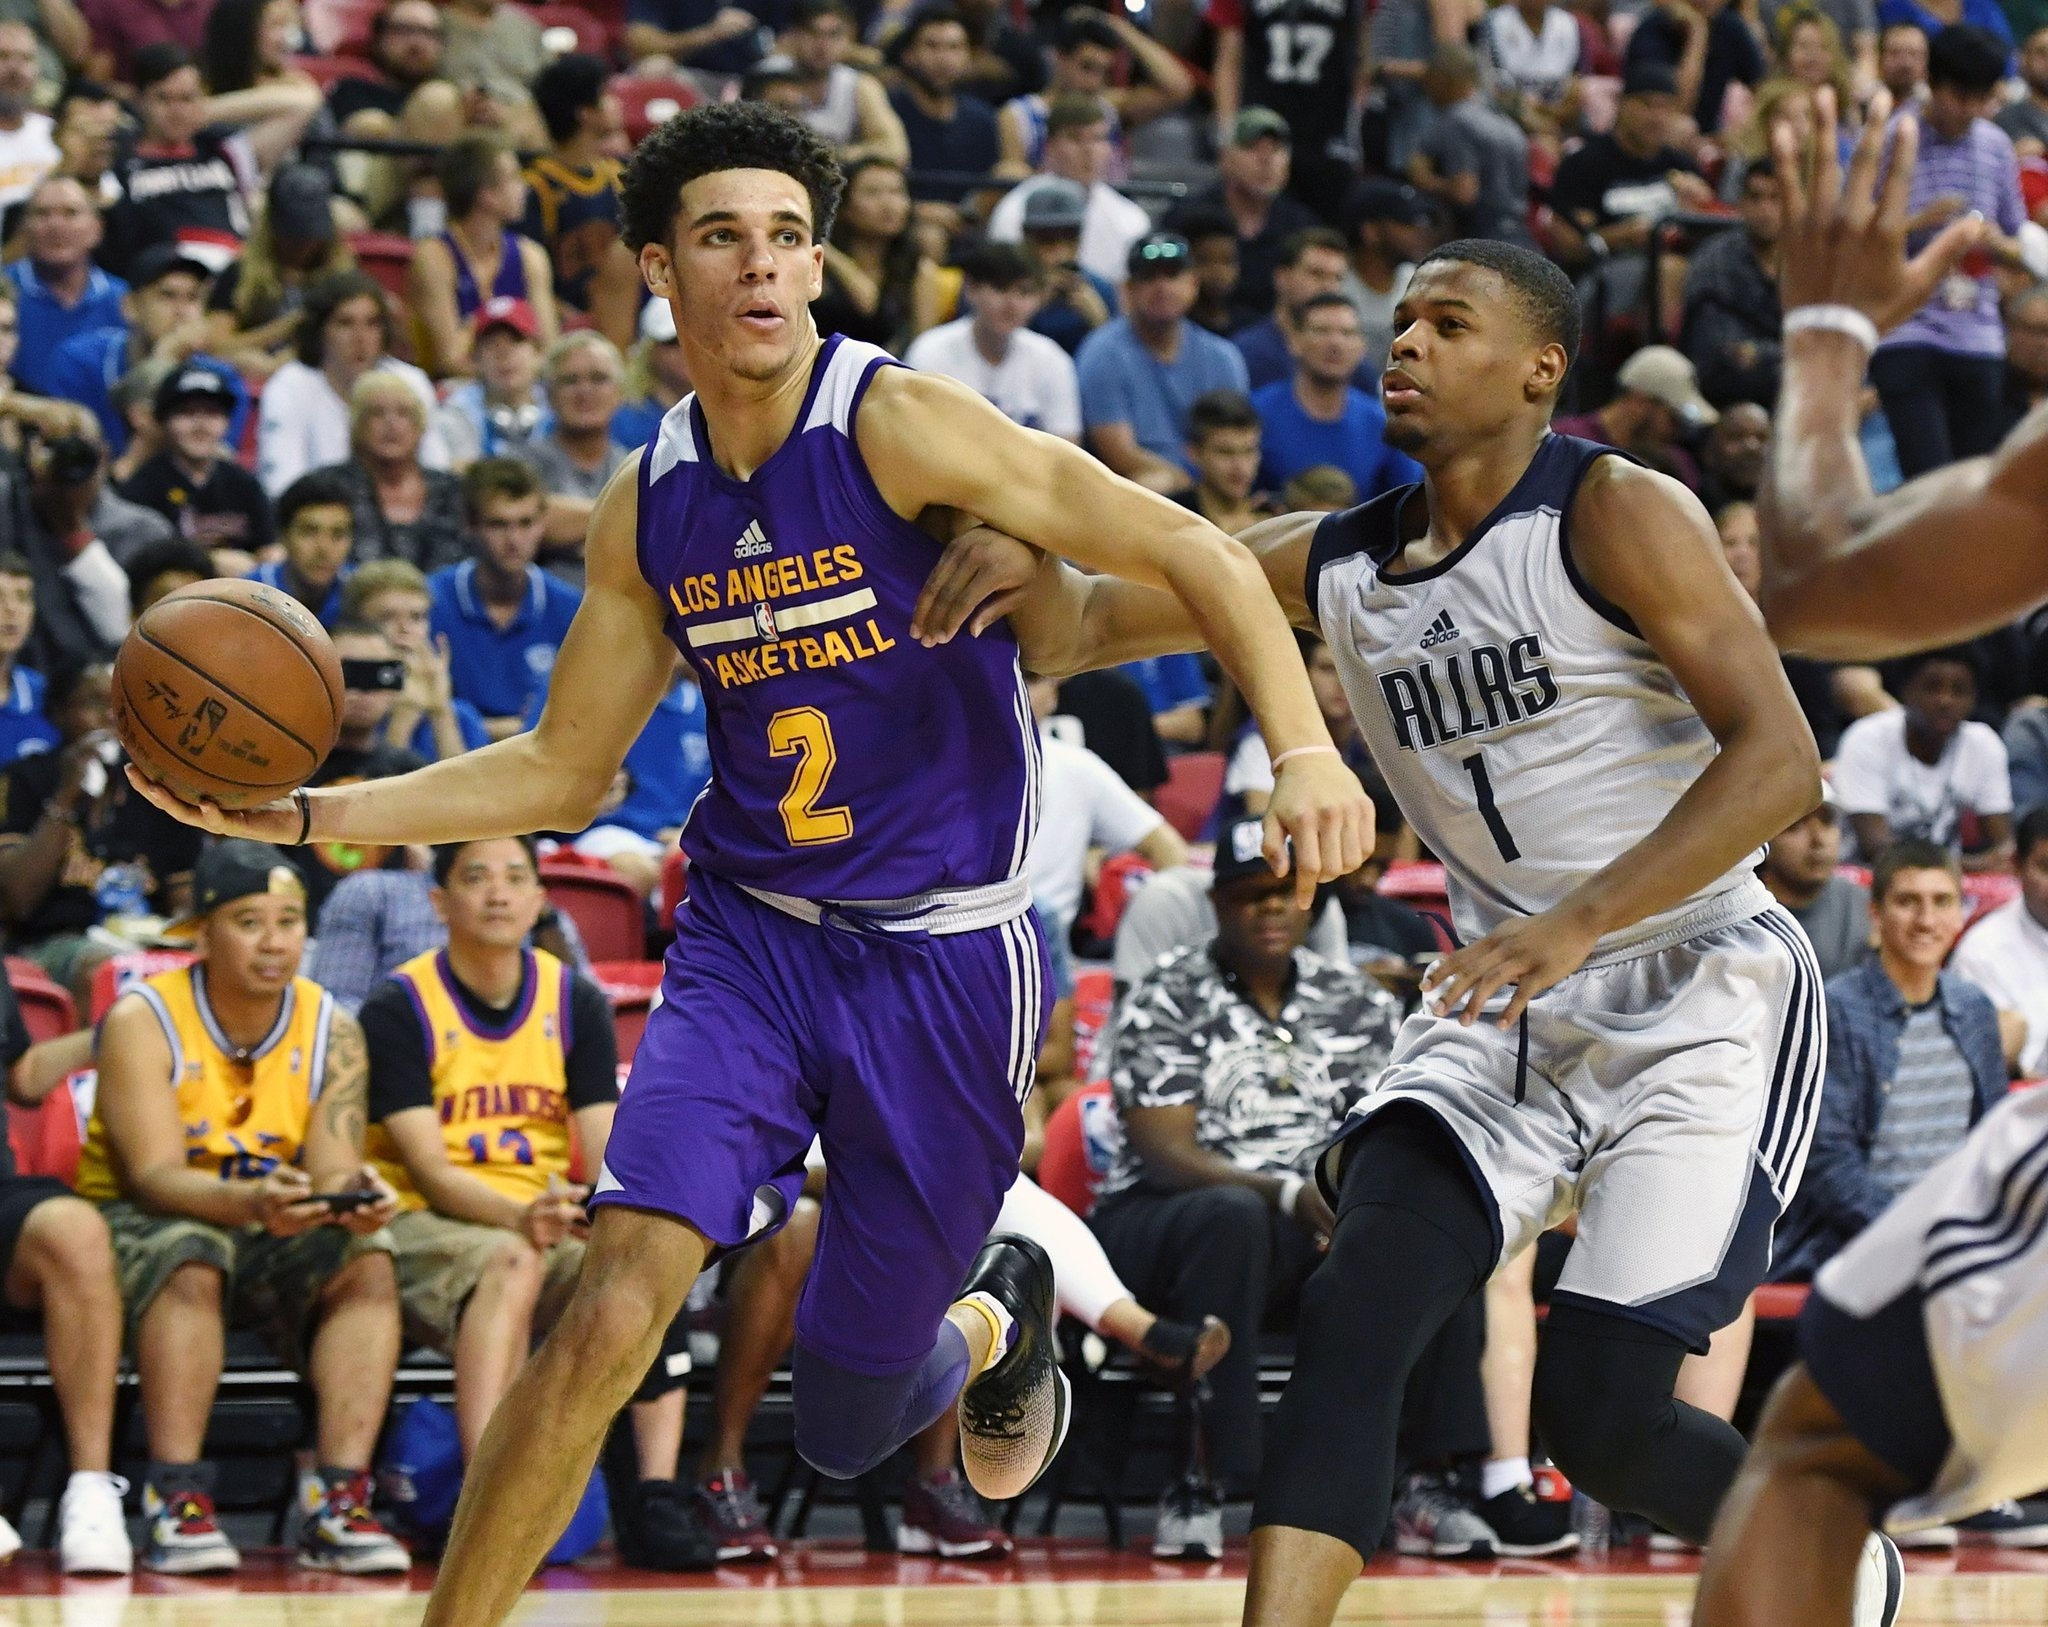 Sunday's #NBASummer Standouts!  (via @langwhitaker): https://t.co/NBM79AFsYF https://t.co/KtTVk2aSfn